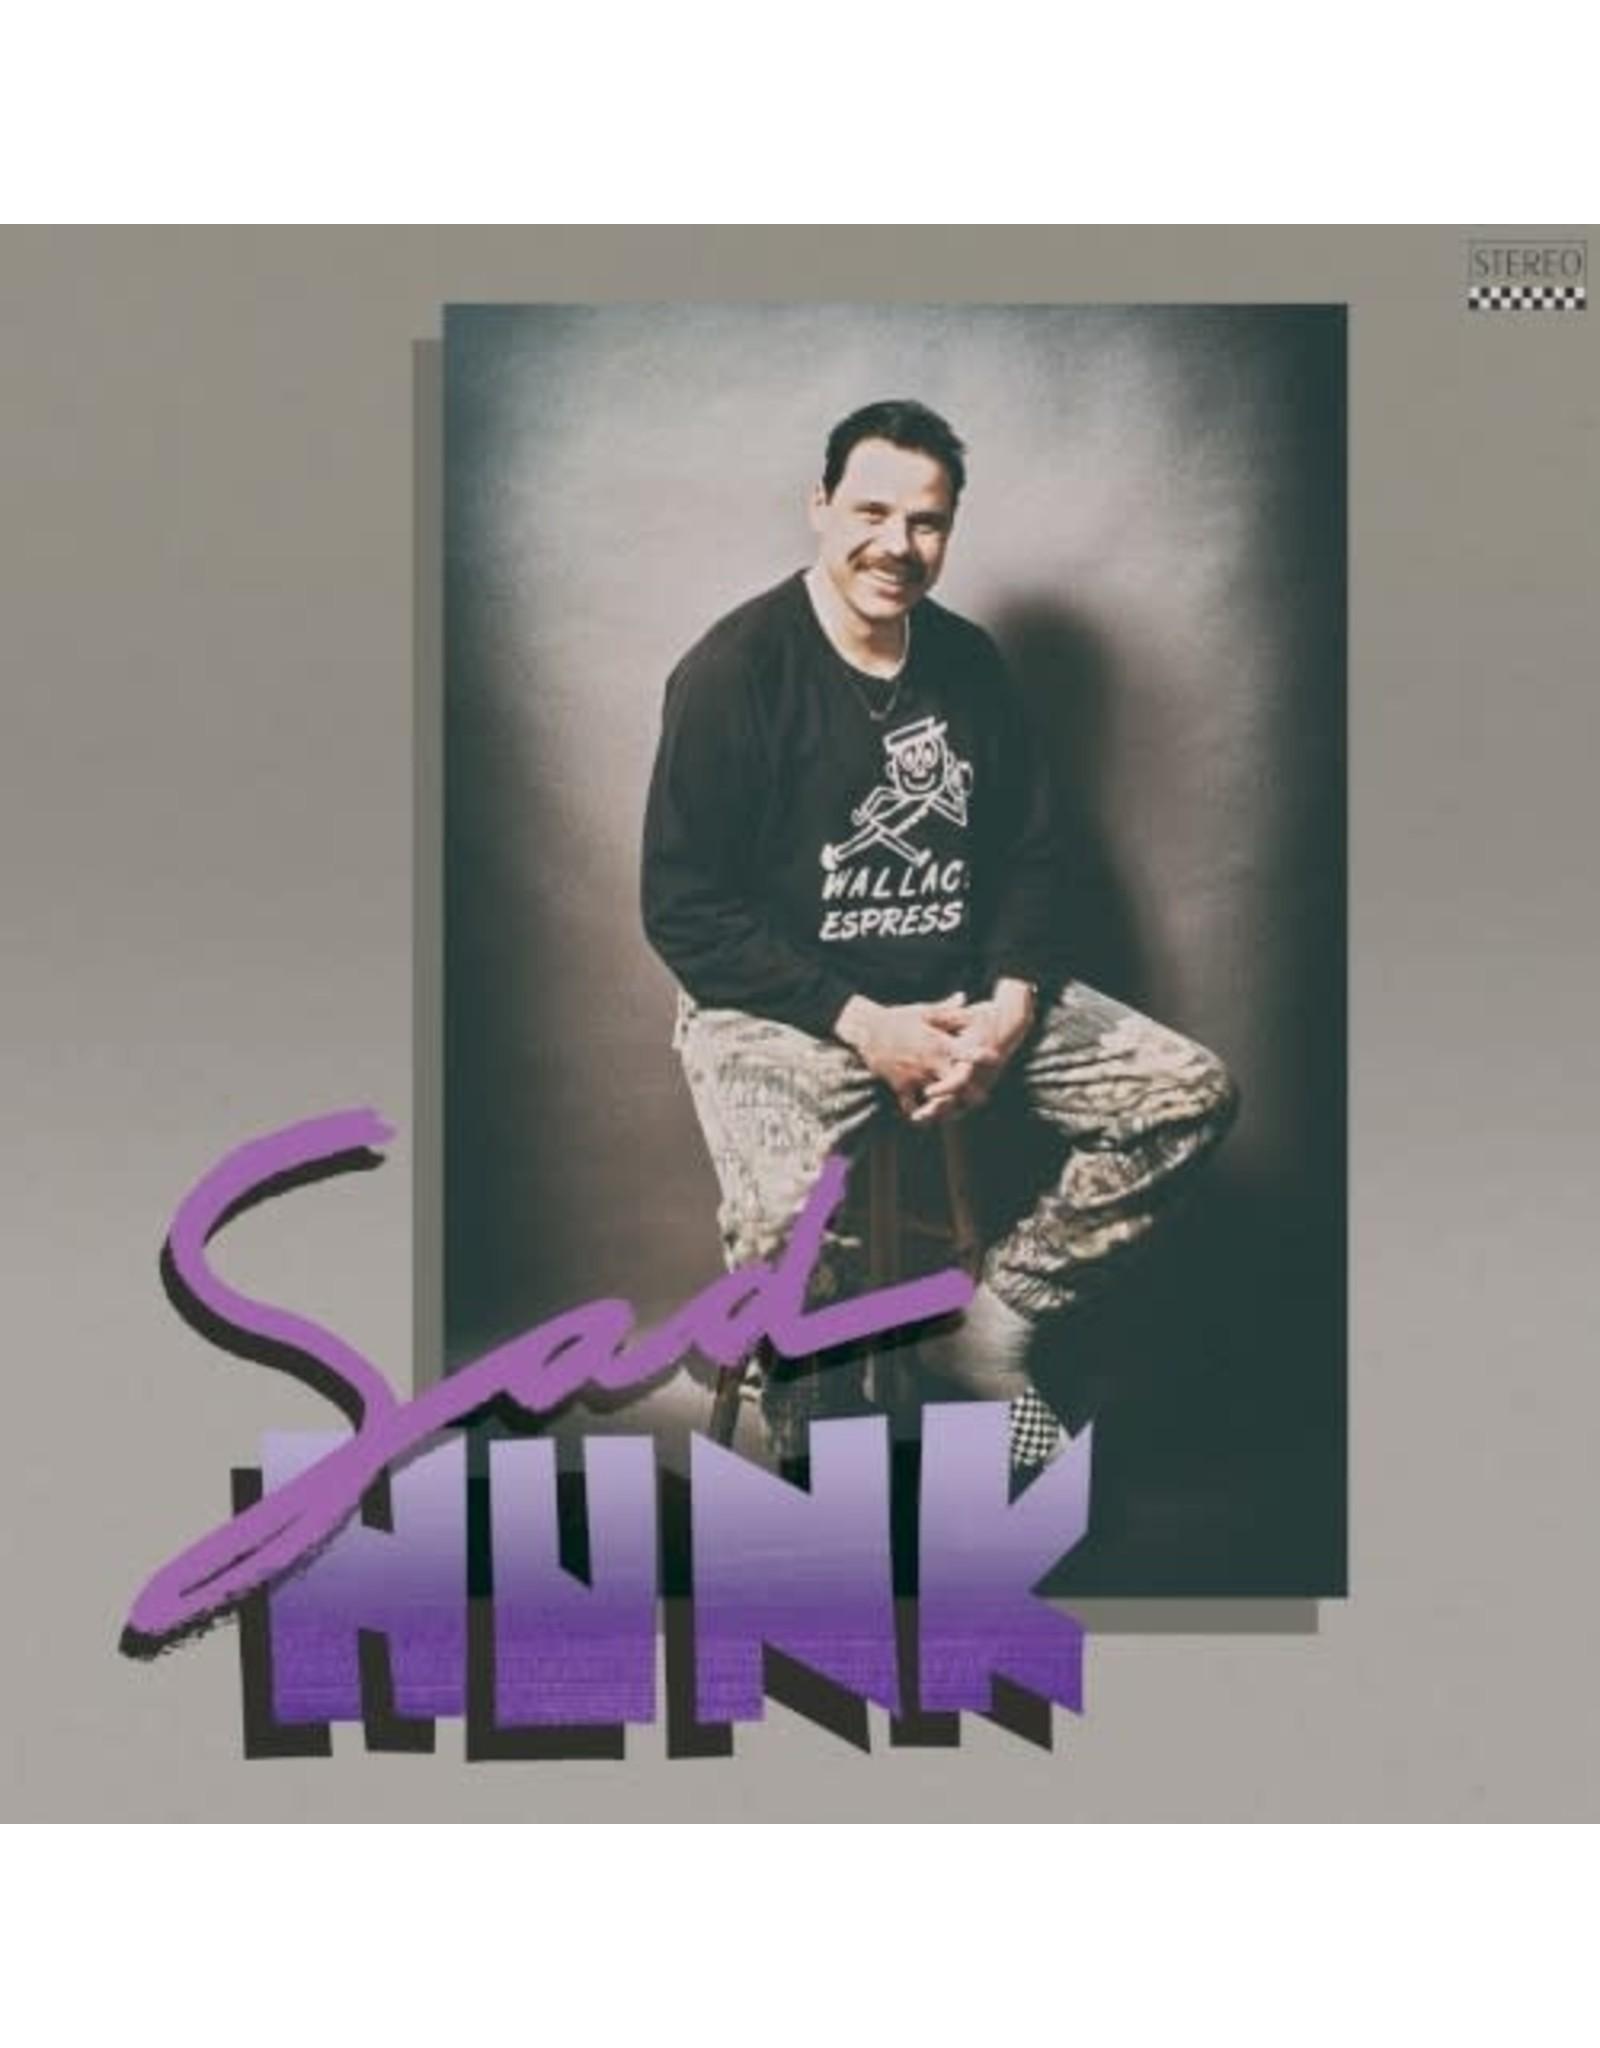 Bahamas - Sad Hunk CD